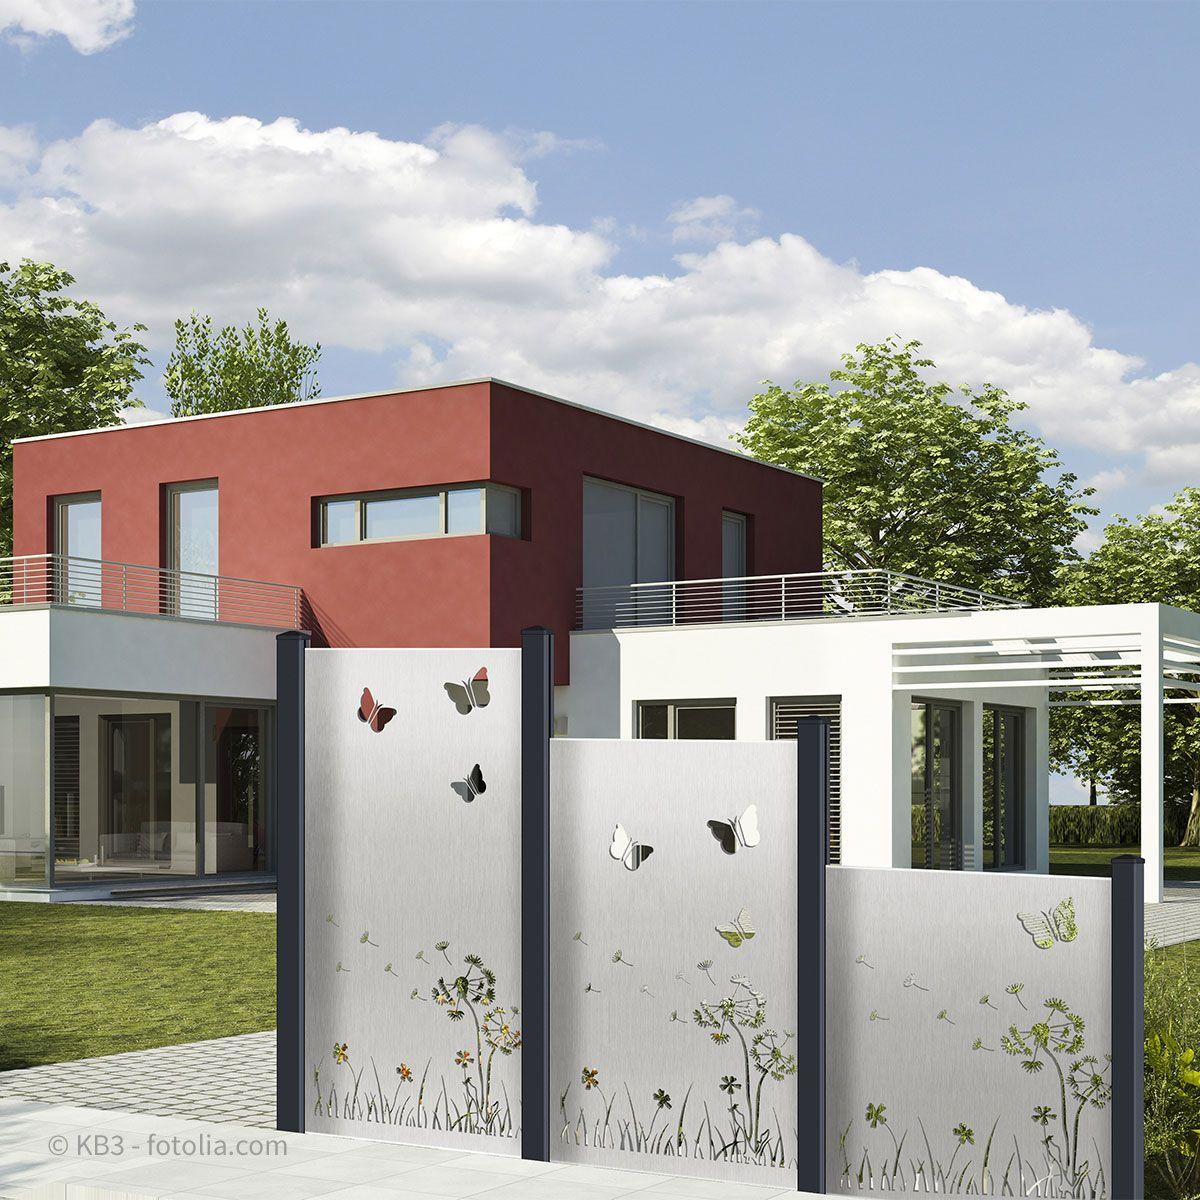 Design Edelstahl Blechfullung Motiv Wiese Pusteblume In 2020